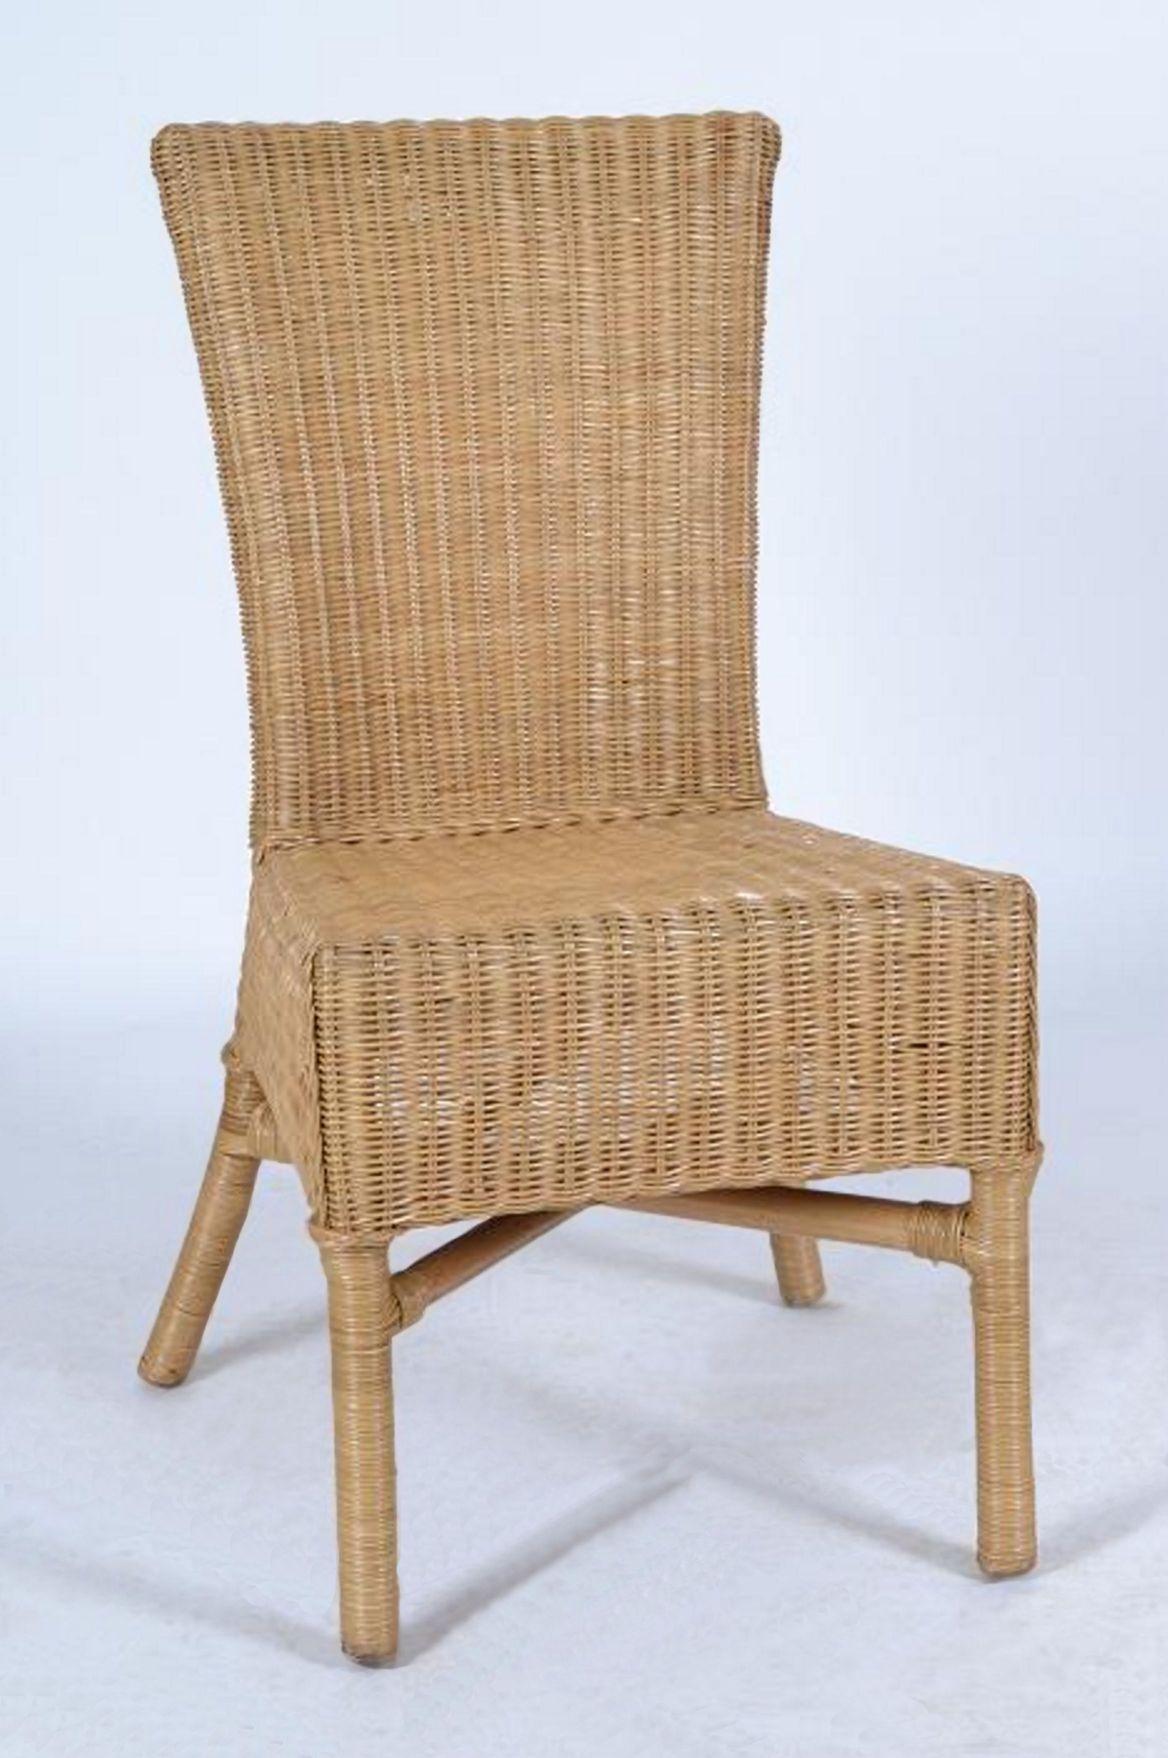 rattanstuhl 39 paris 39 rattan m bel honig 80014 ebay. Black Bedroom Furniture Sets. Home Design Ideas